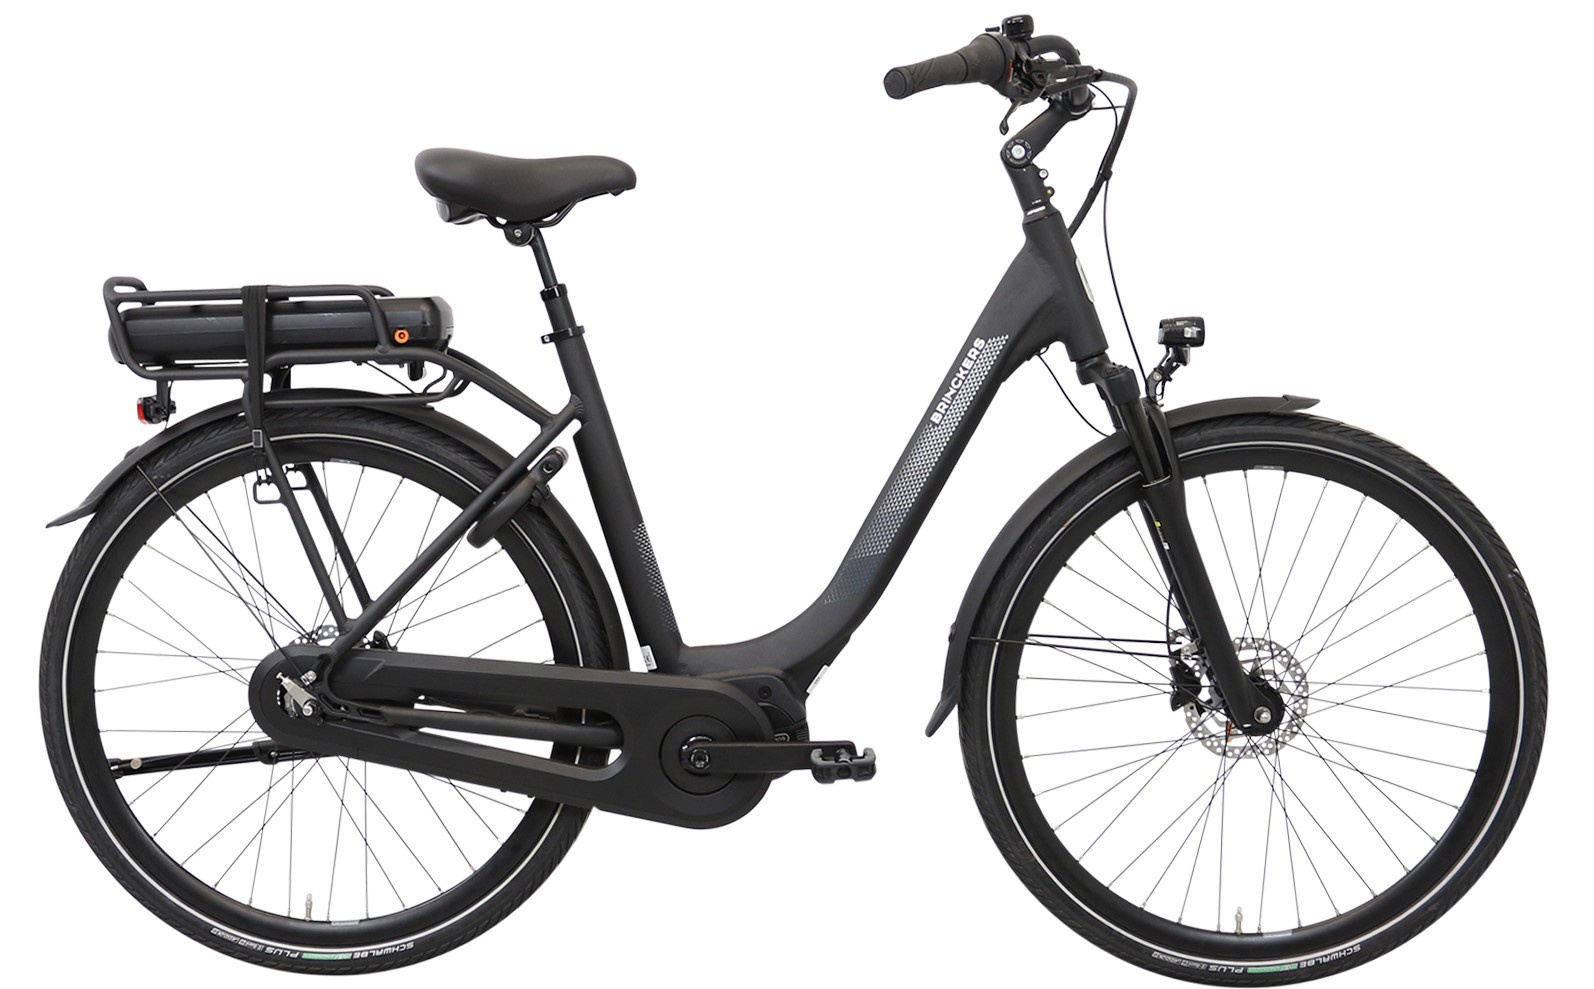 Brinckers Brisbane elektrische fiets M310 Enviolo met middenmotor